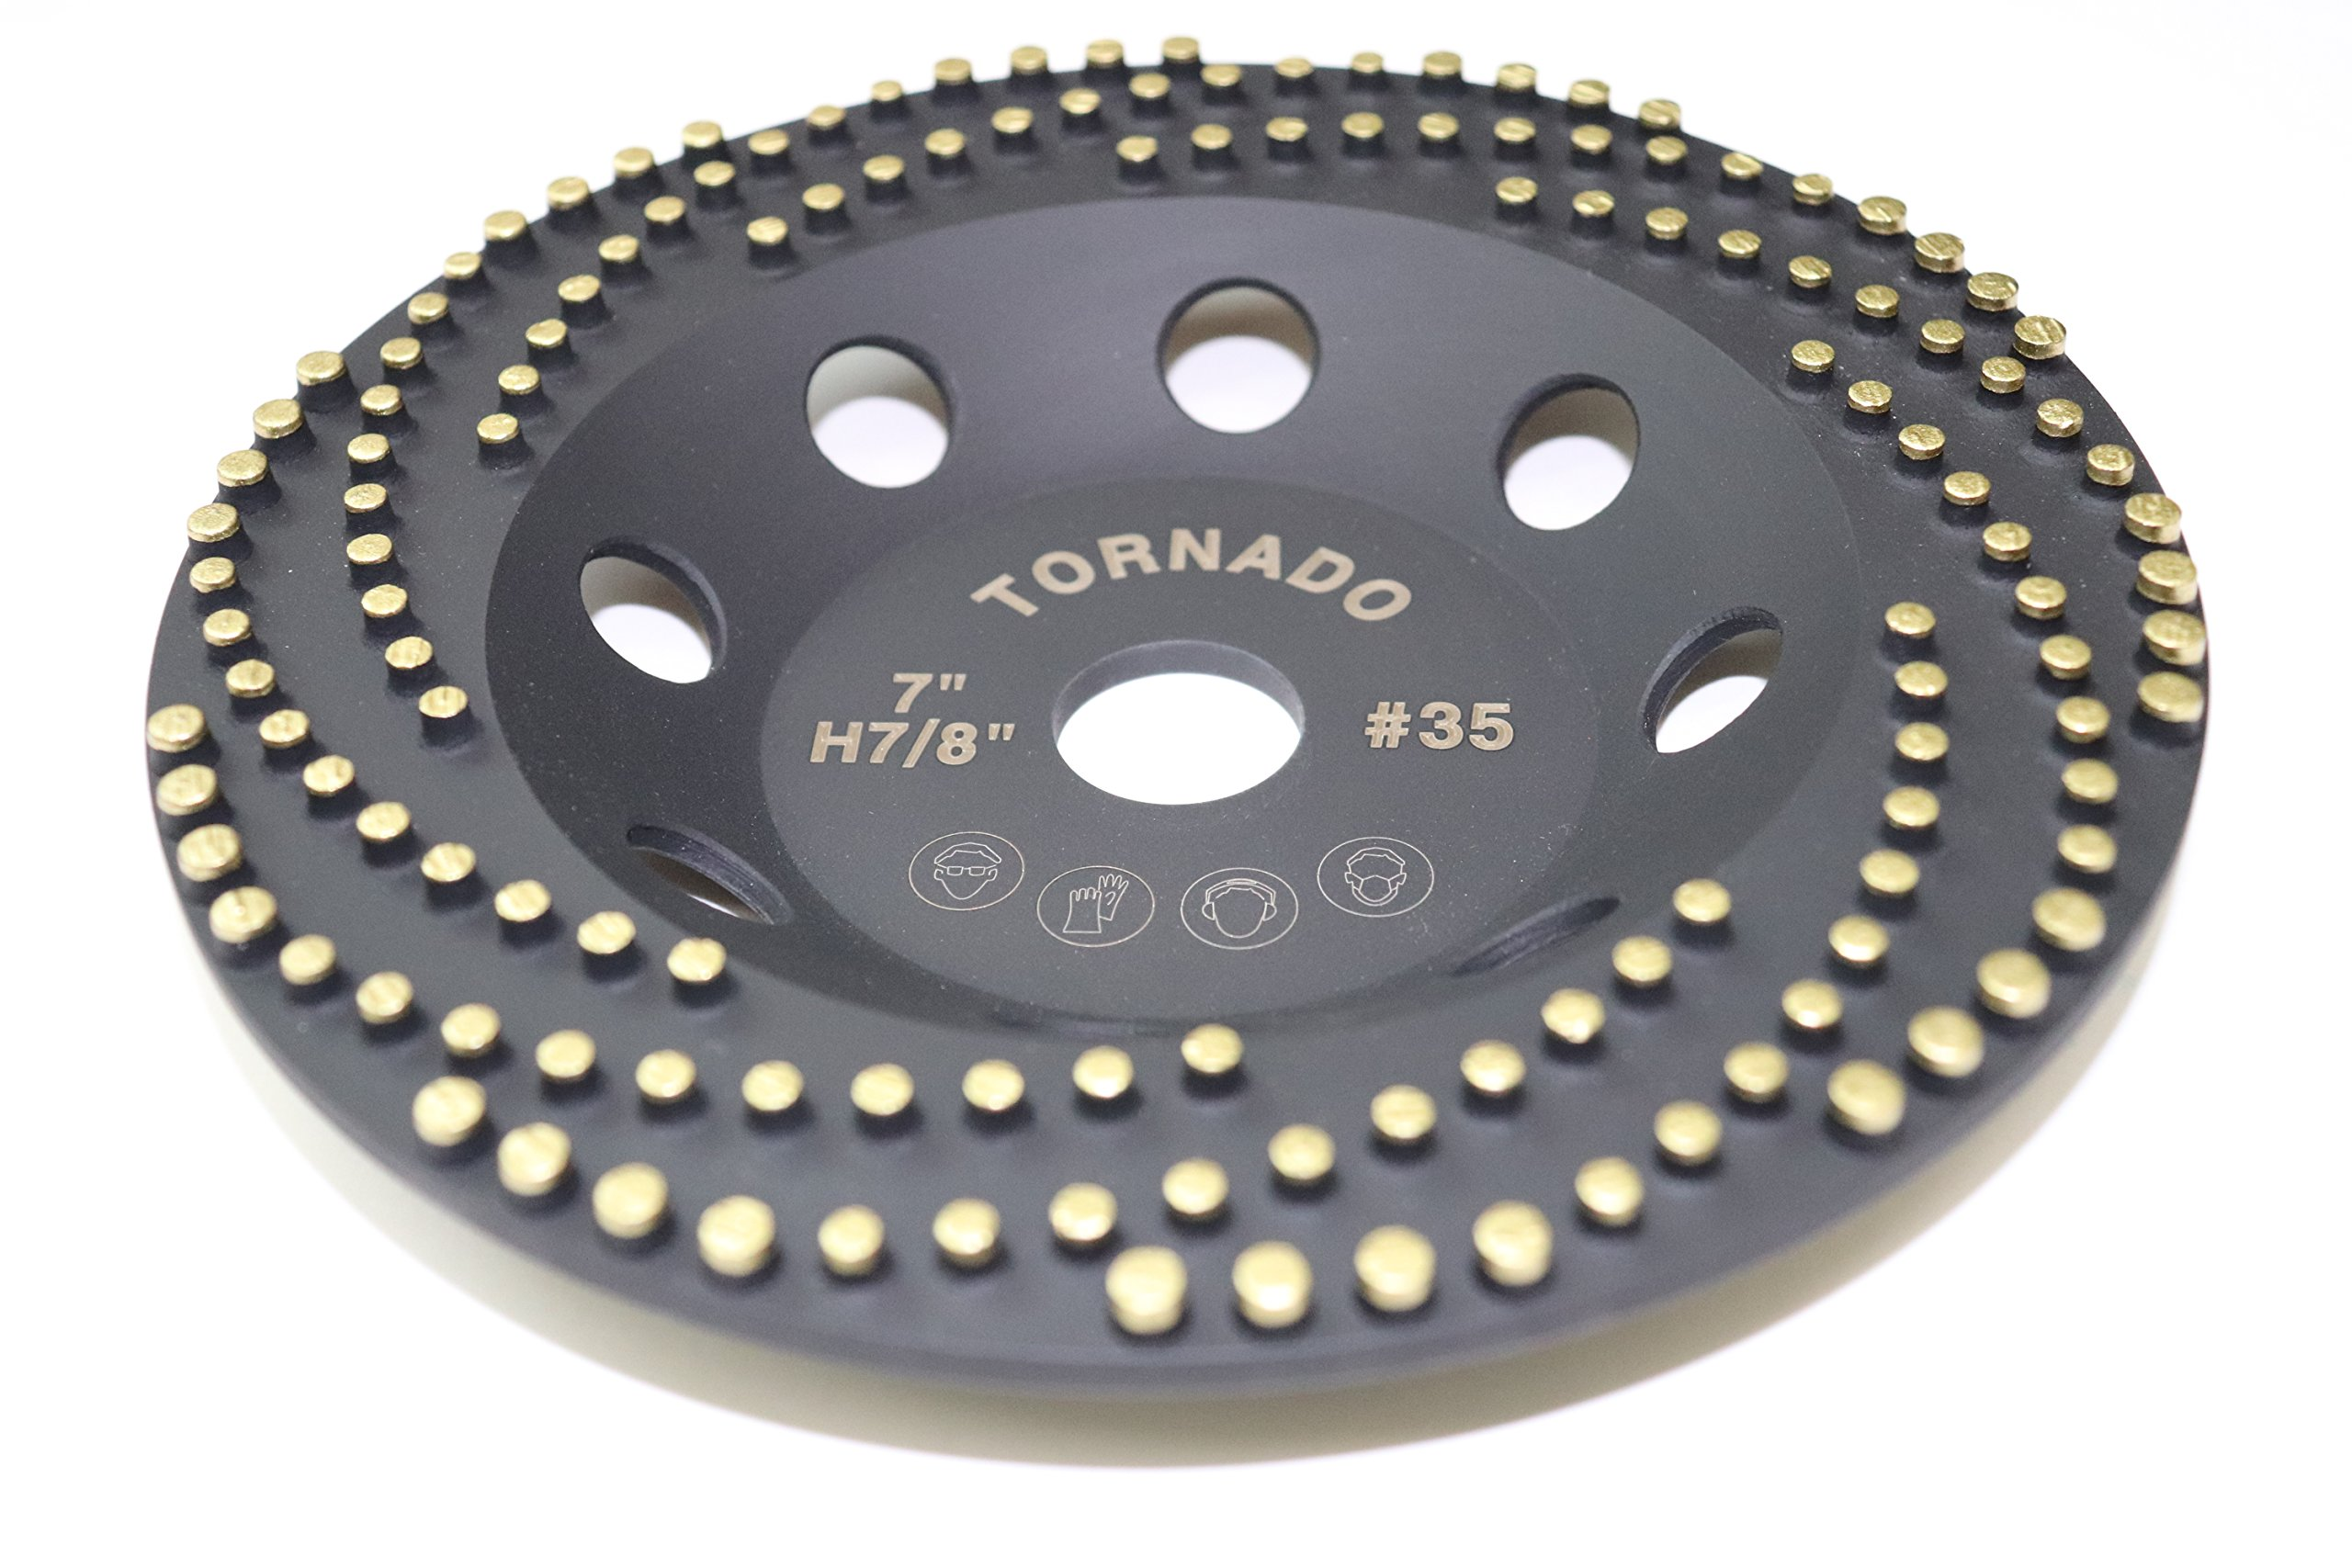 Tornado 7'' Diamond Cup Grinding Removing Disc Wheel with CDB Newest Technology (Tornado, 7'')